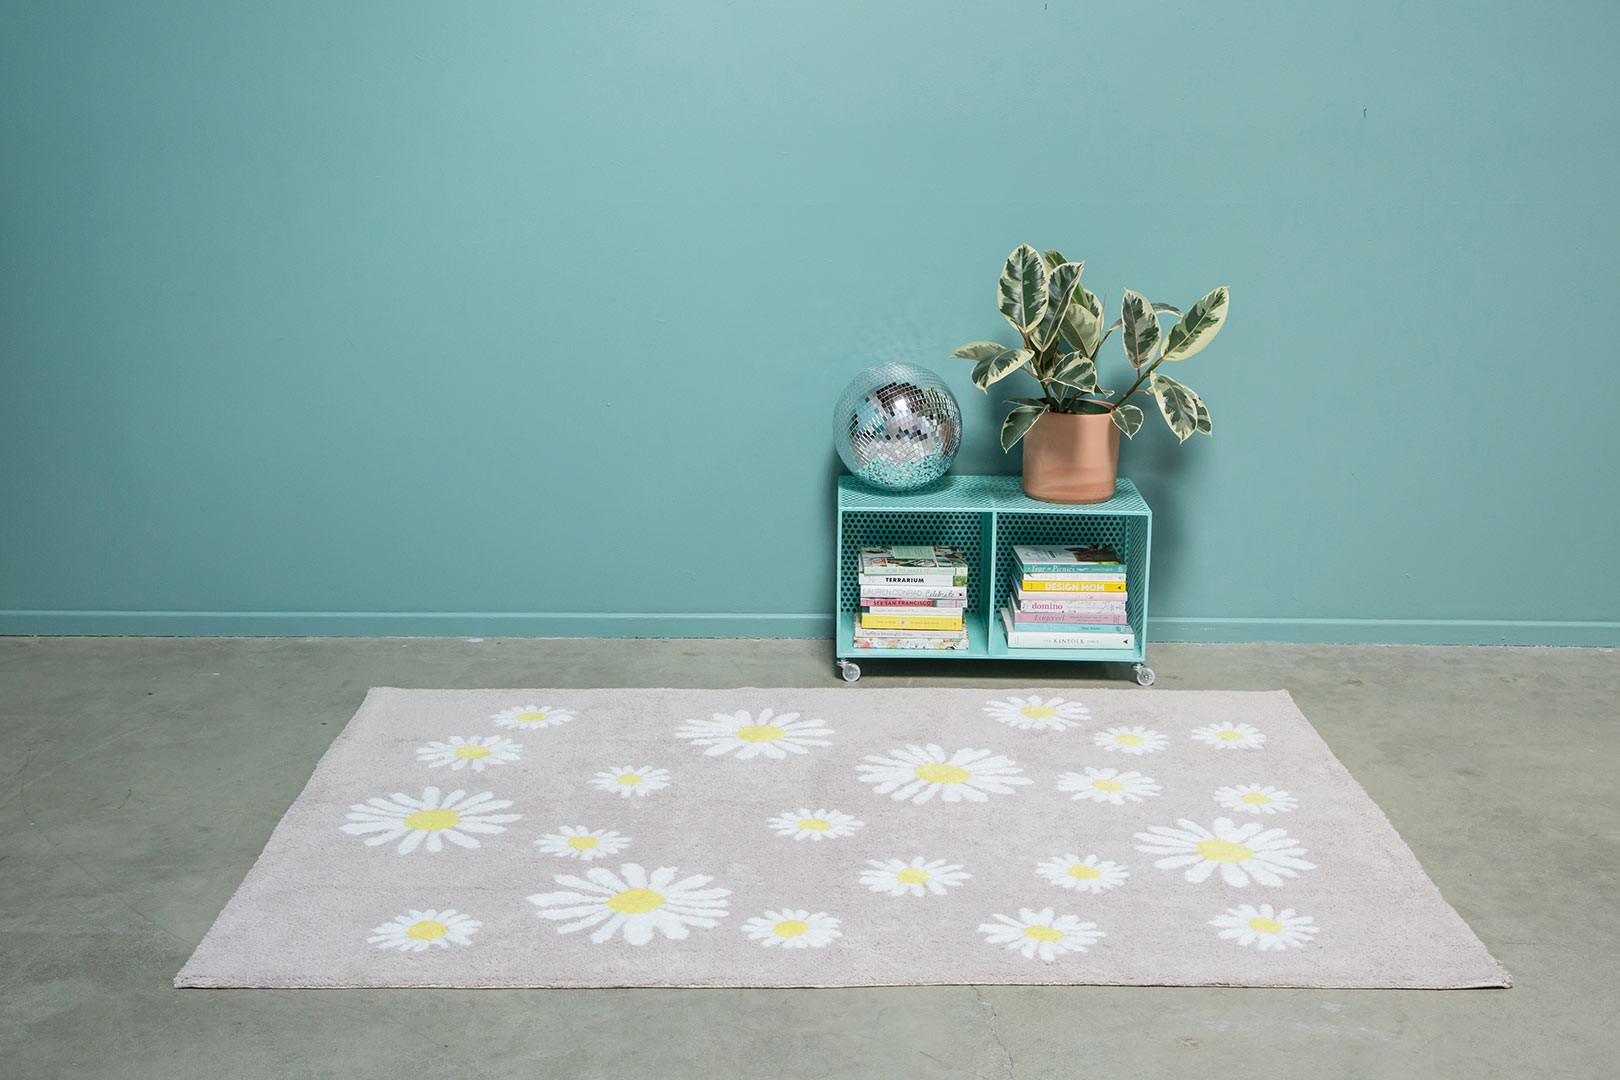 Tapis beige lavable en machine floral Oh Daisies Lorena Canals